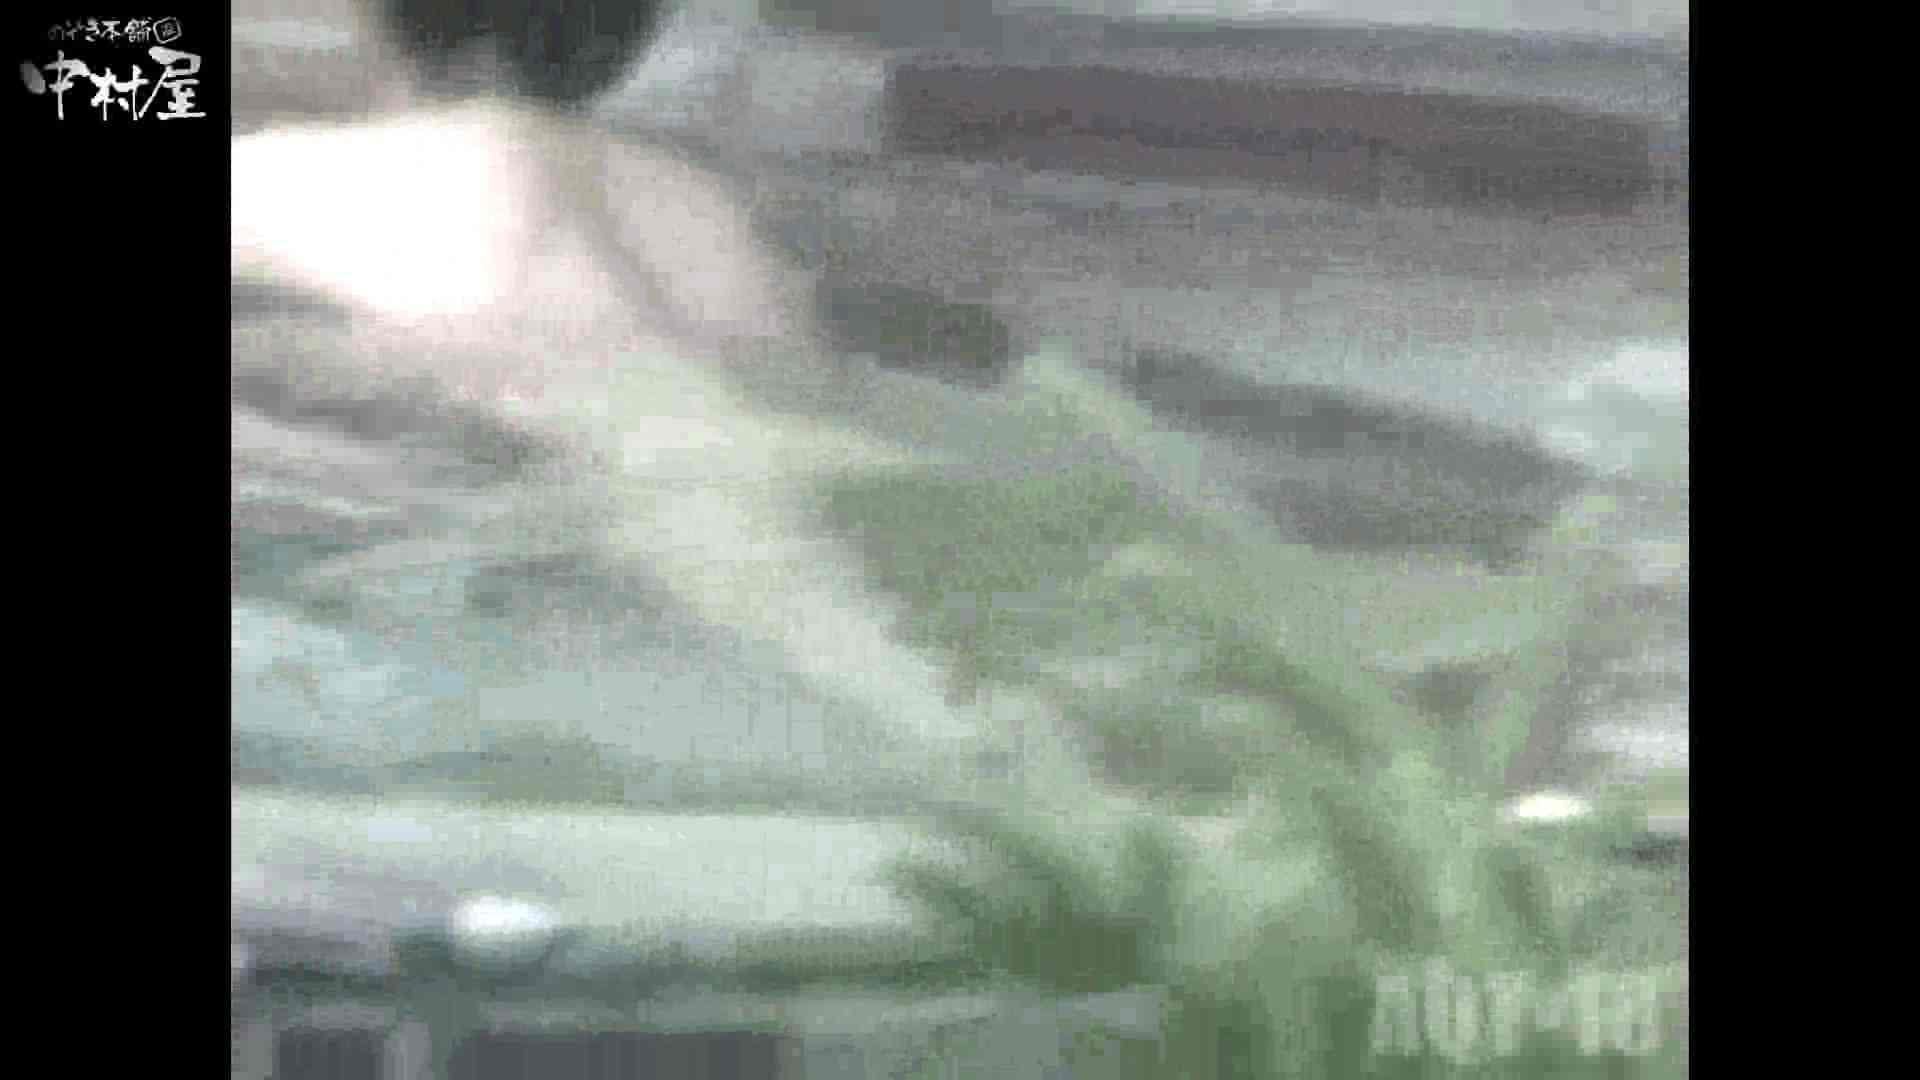 Aquaな露天風呂Vol.882潜入盗撮露天風呂十八判湯 其の二 盗撮 性交動画流出 90画像 42